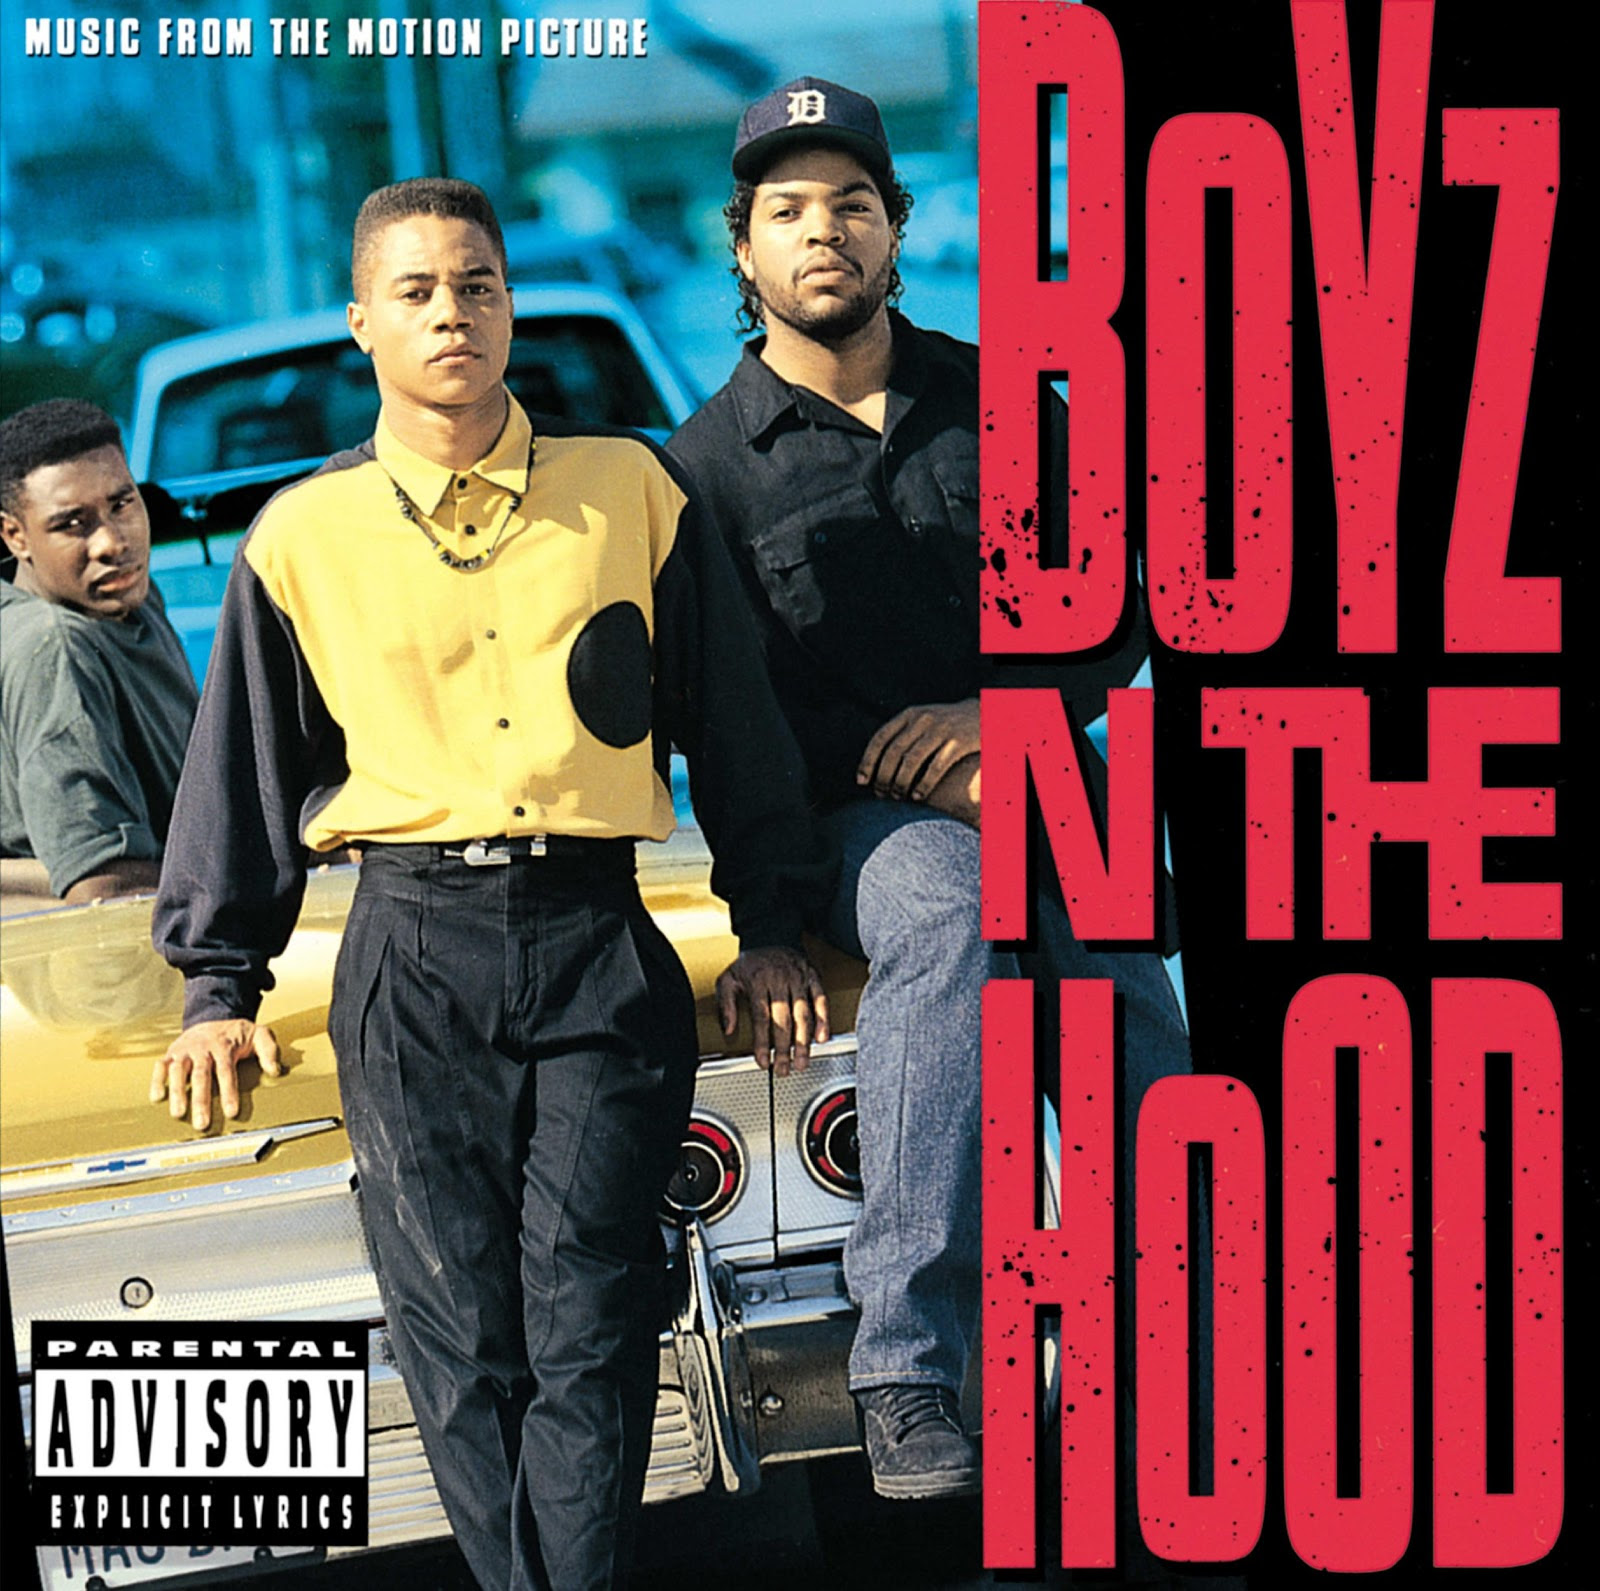 Boyz N The Hood Soundtrack Receives Double-Vinyl Reissue